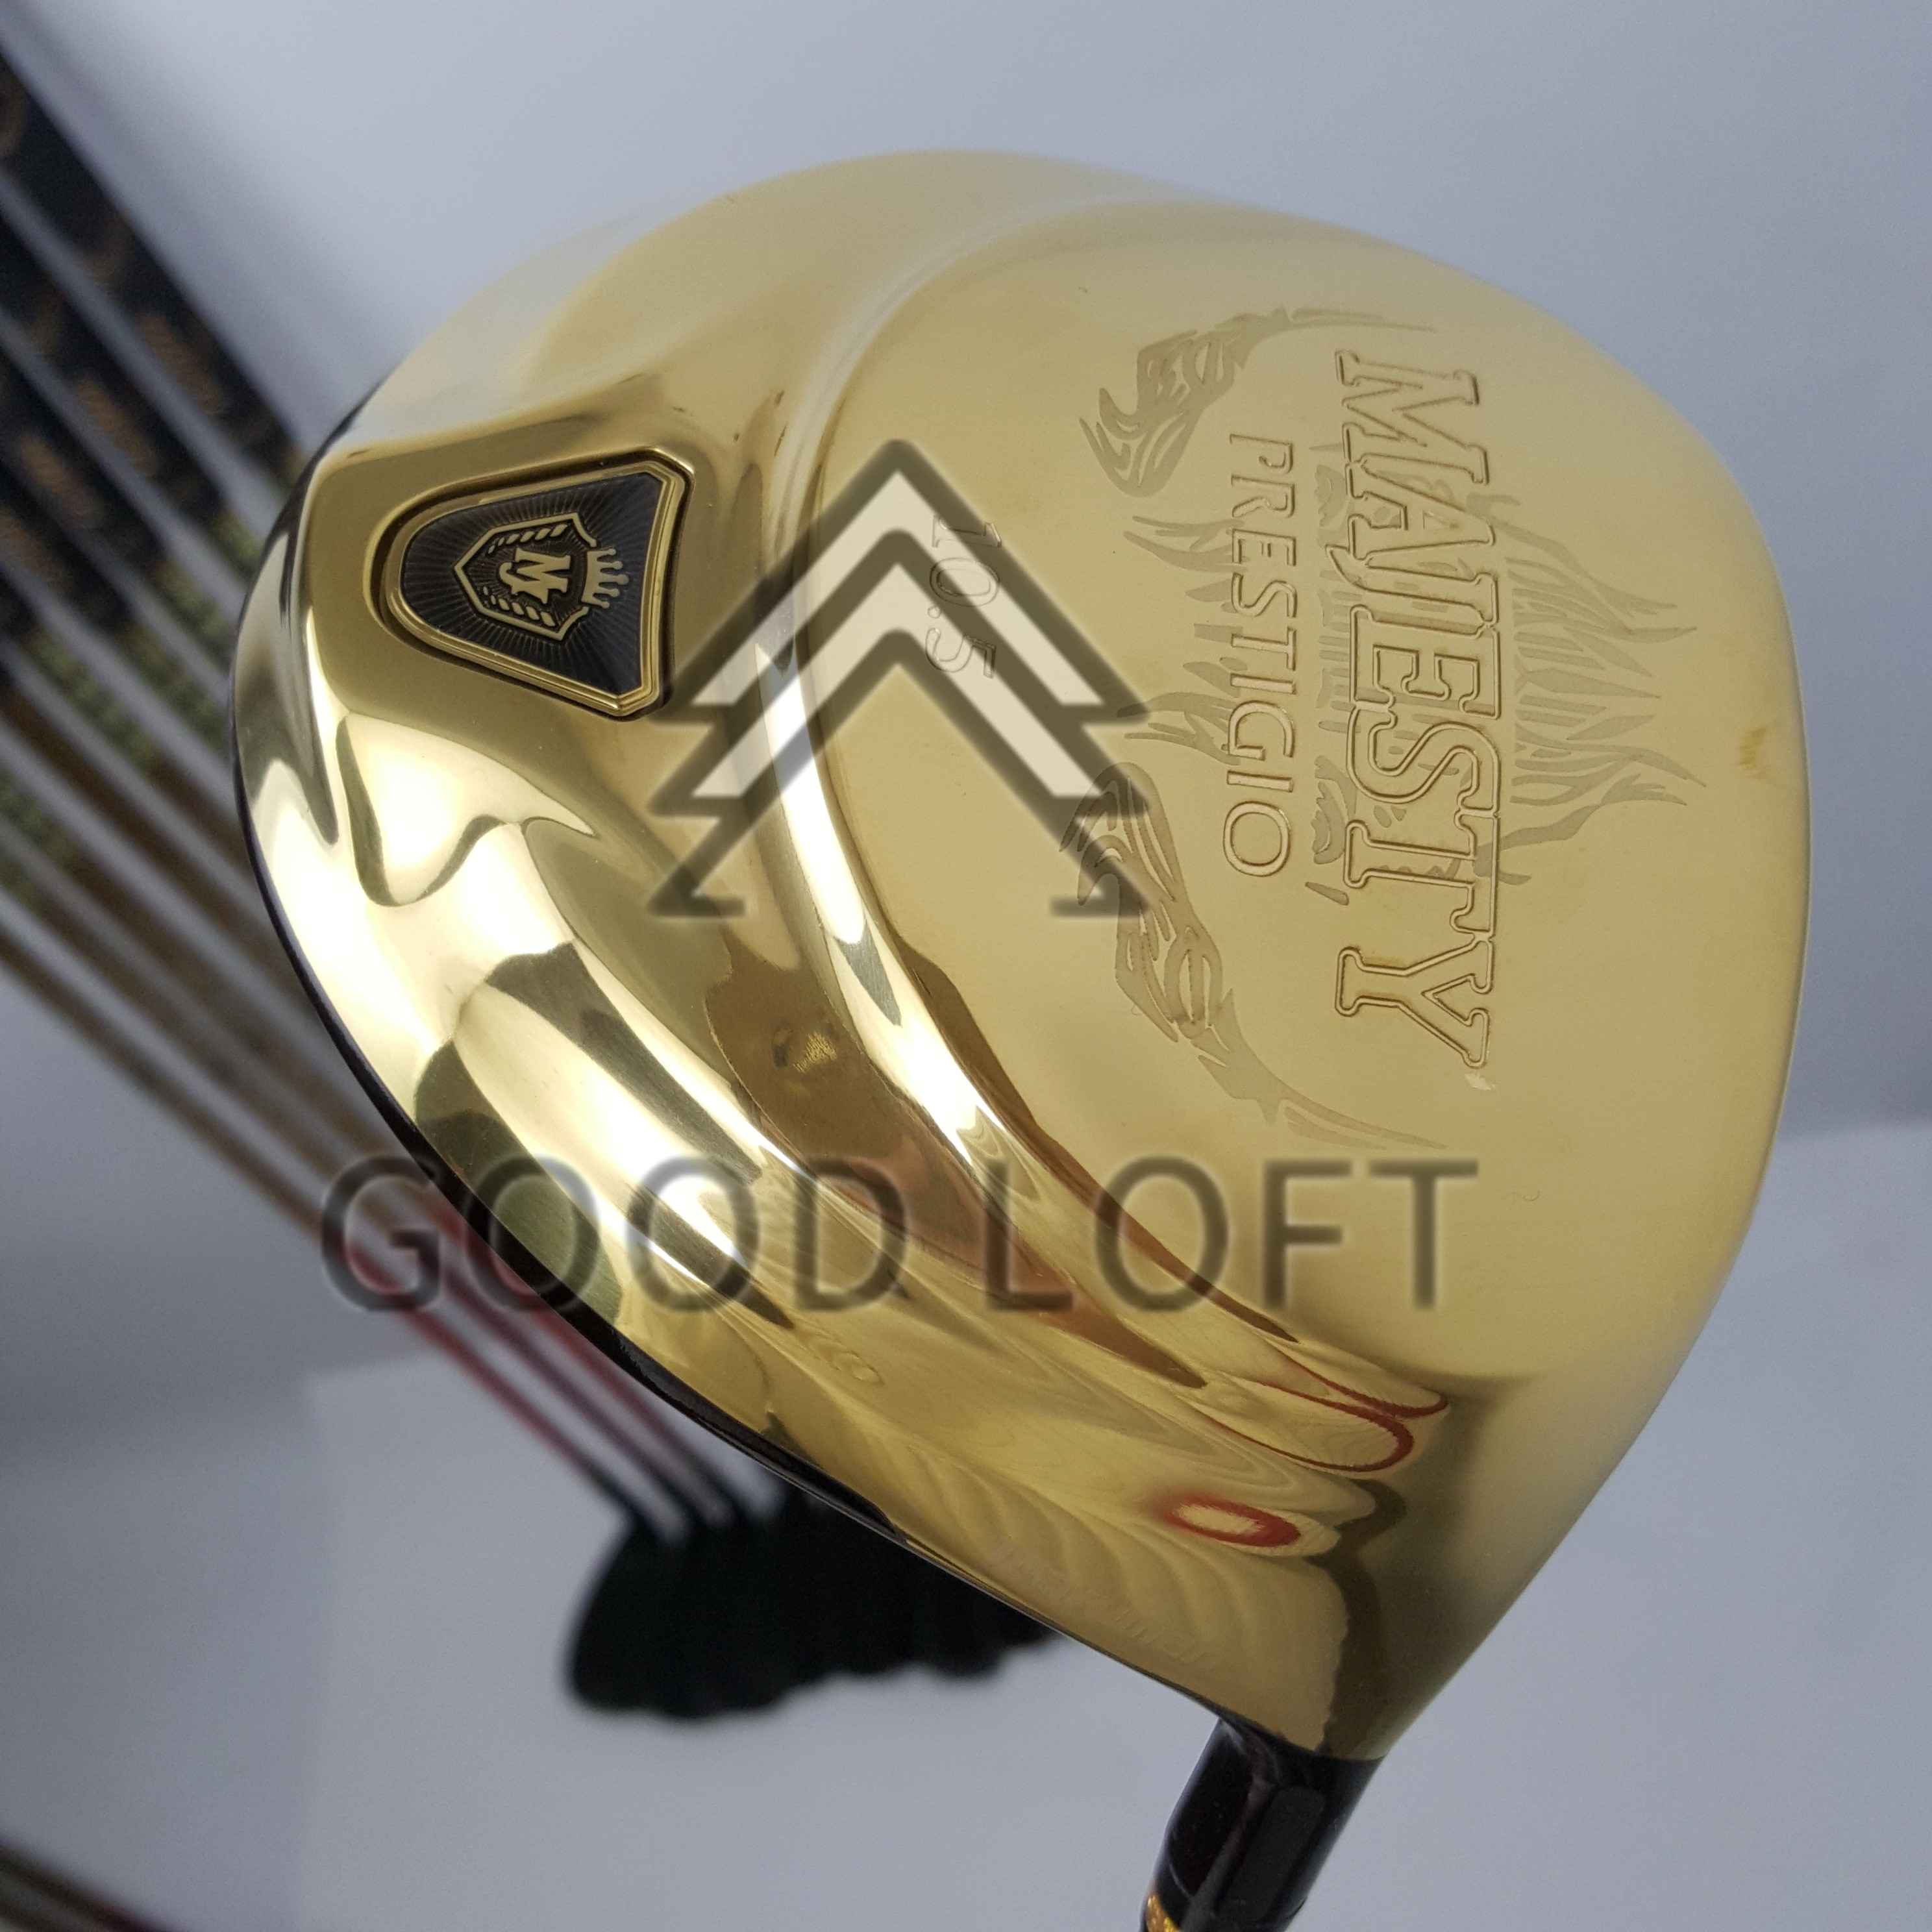 Maruman Majesty Prestigio 9 Golf Drive 9.5 or 10.5  and 3/5wood Graphite shaft R / S flex with club head free shipping